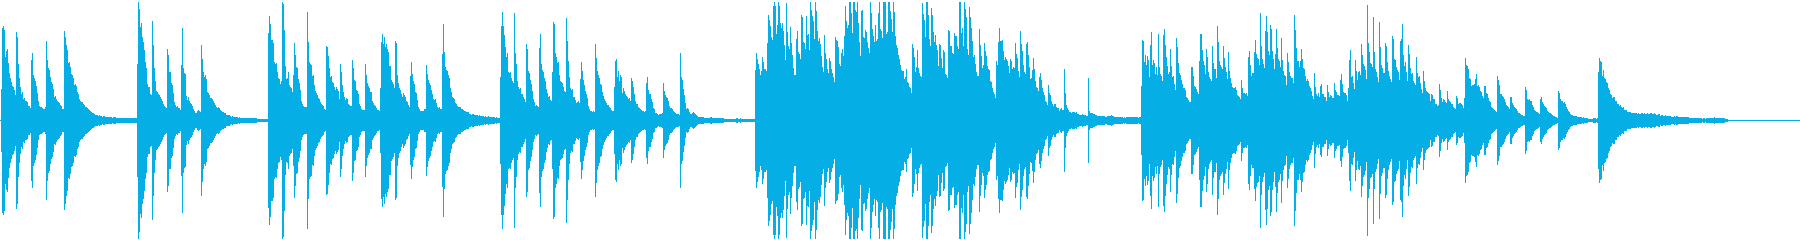 CMや映像に 純真で澄み切ったピアノソロの再生済みの波形